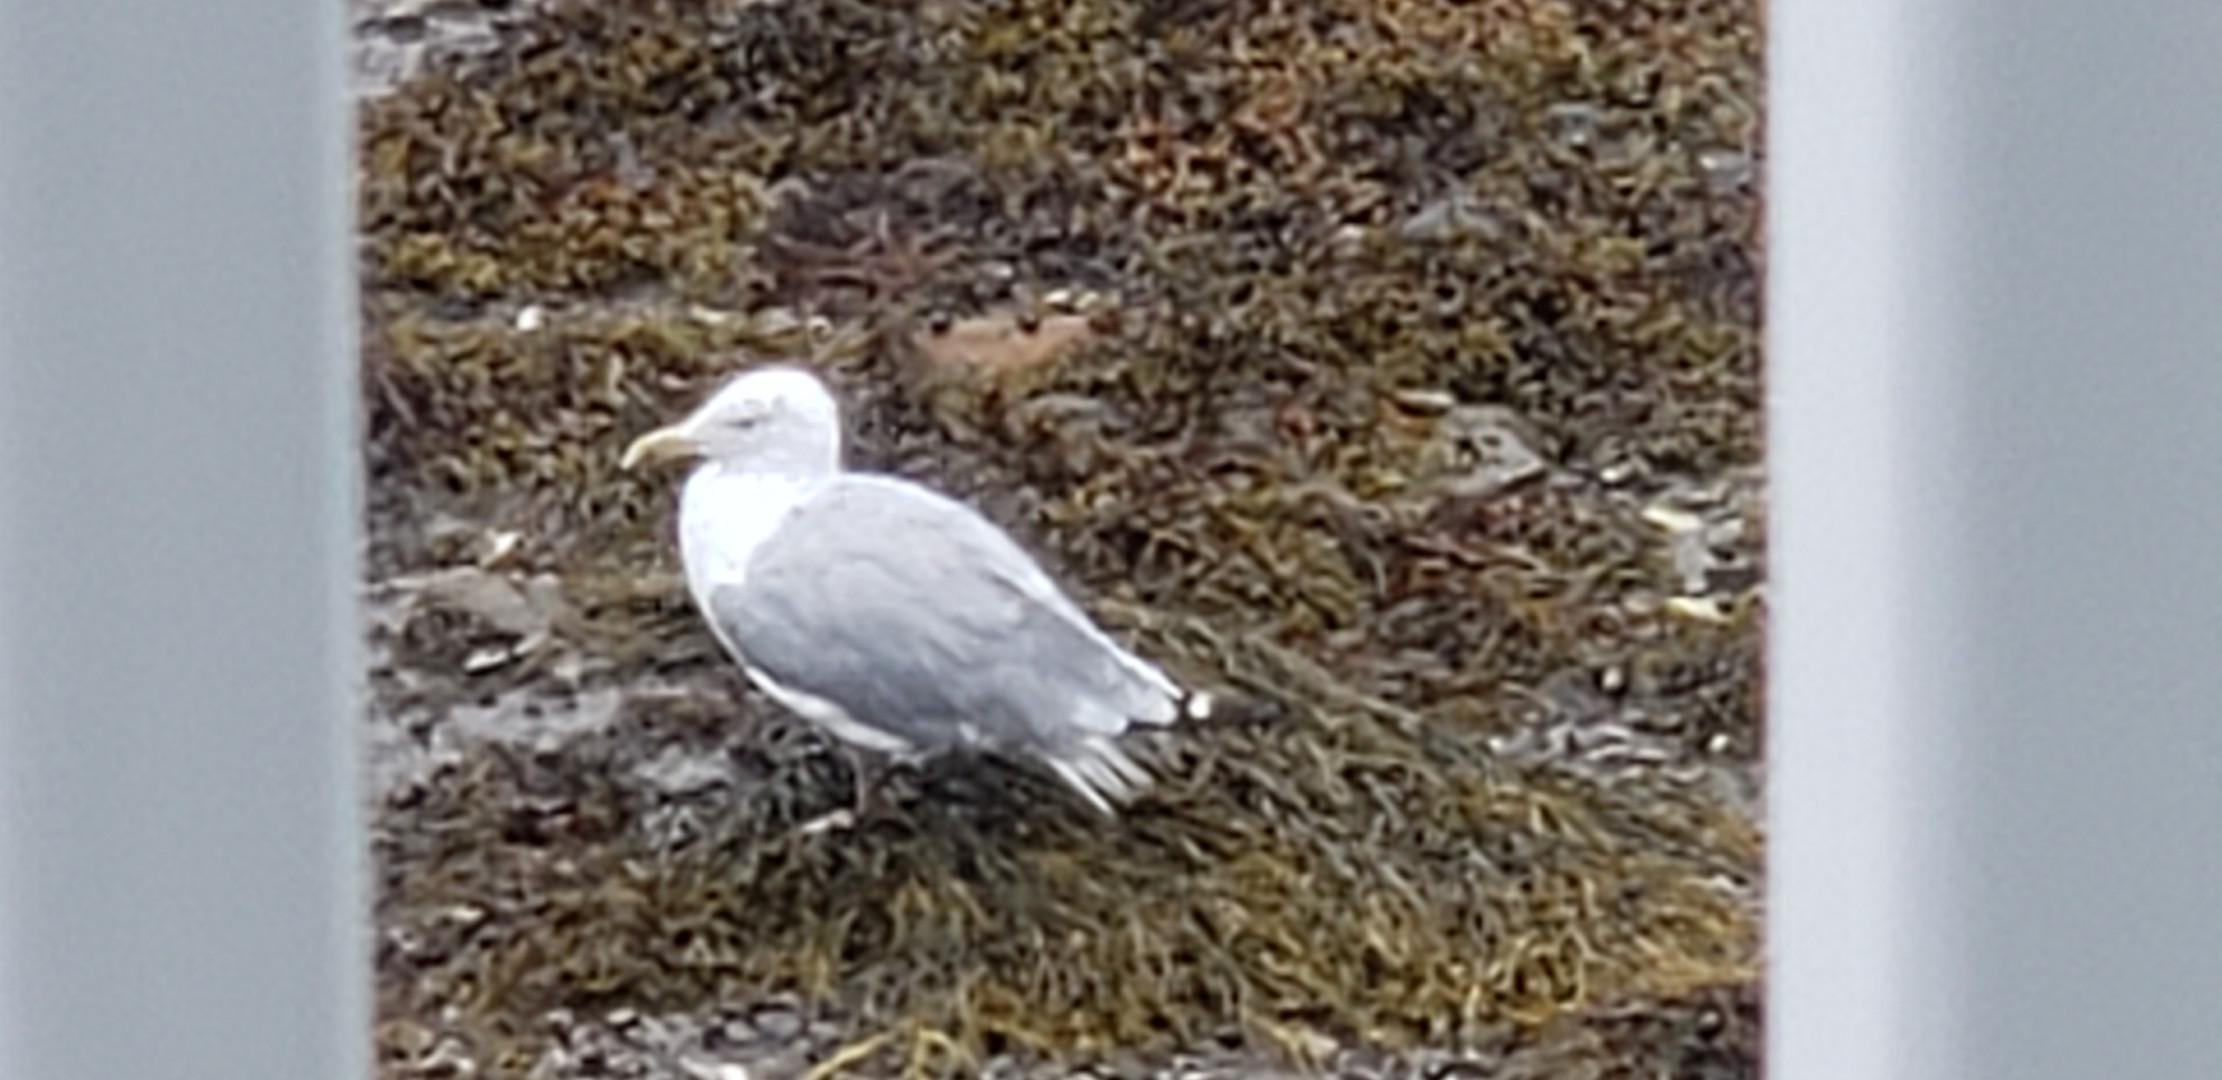 Seagull I helped 9-2-2020